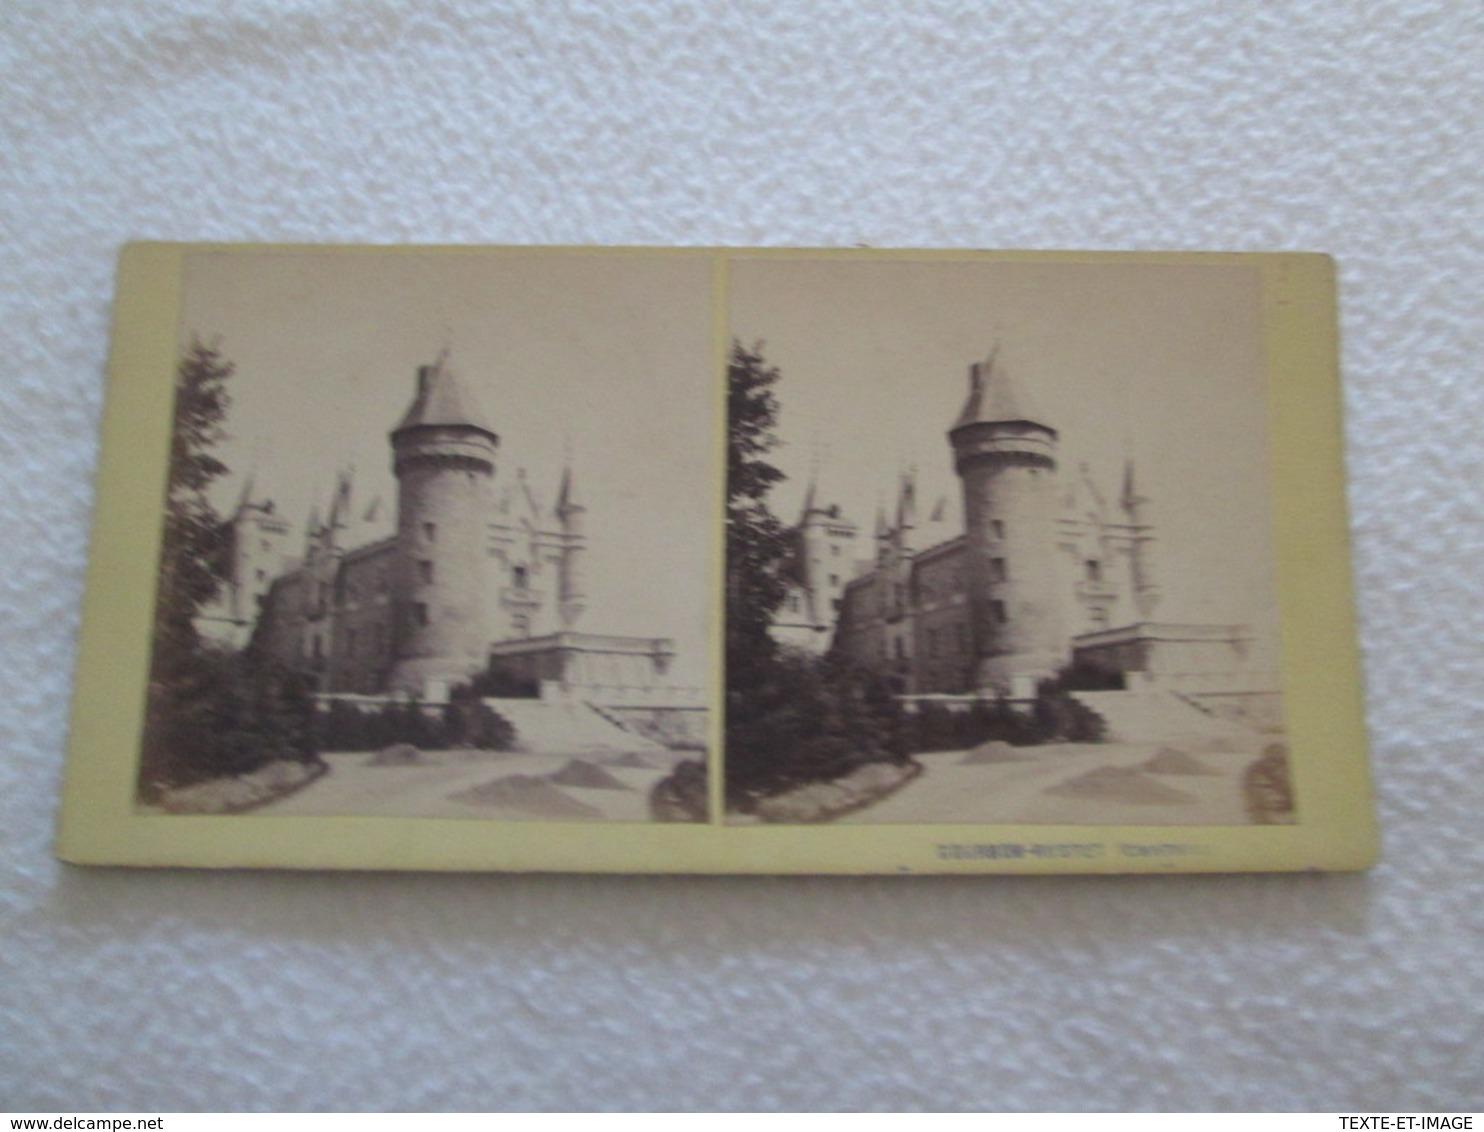 PHOTOGRAPHIE STEREOSCOPIQUE - Château De BOURBON BUSSET [cliché 180X85 Circa 1880] - Photos